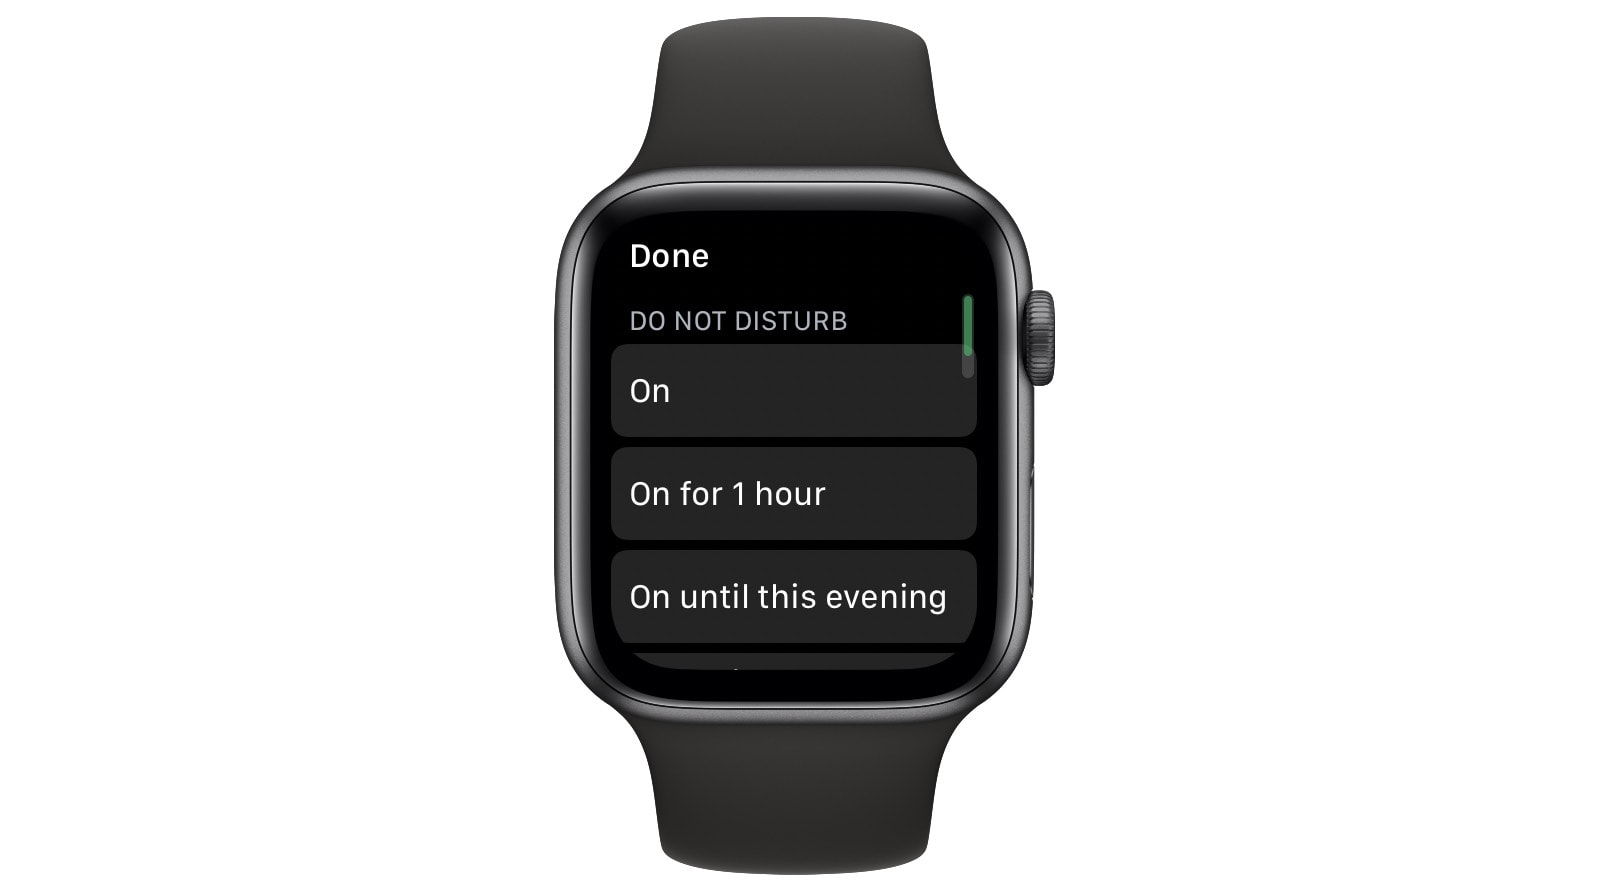 Apple Watch Do Not Disturb.